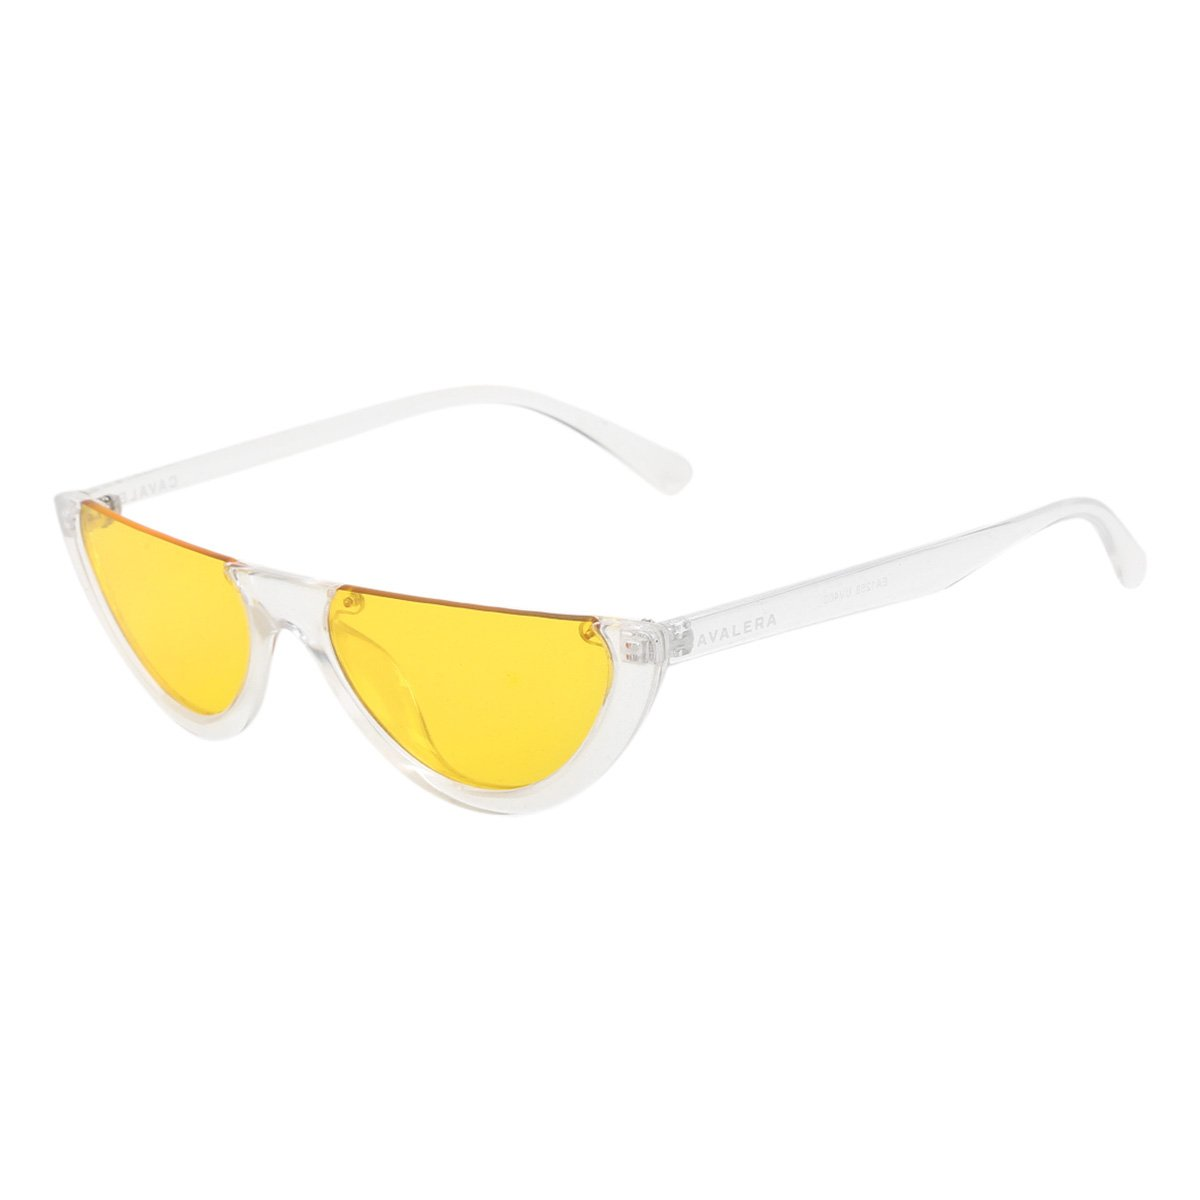 Óculos De Sol Cavalera Gatinho MG0002 Masculino